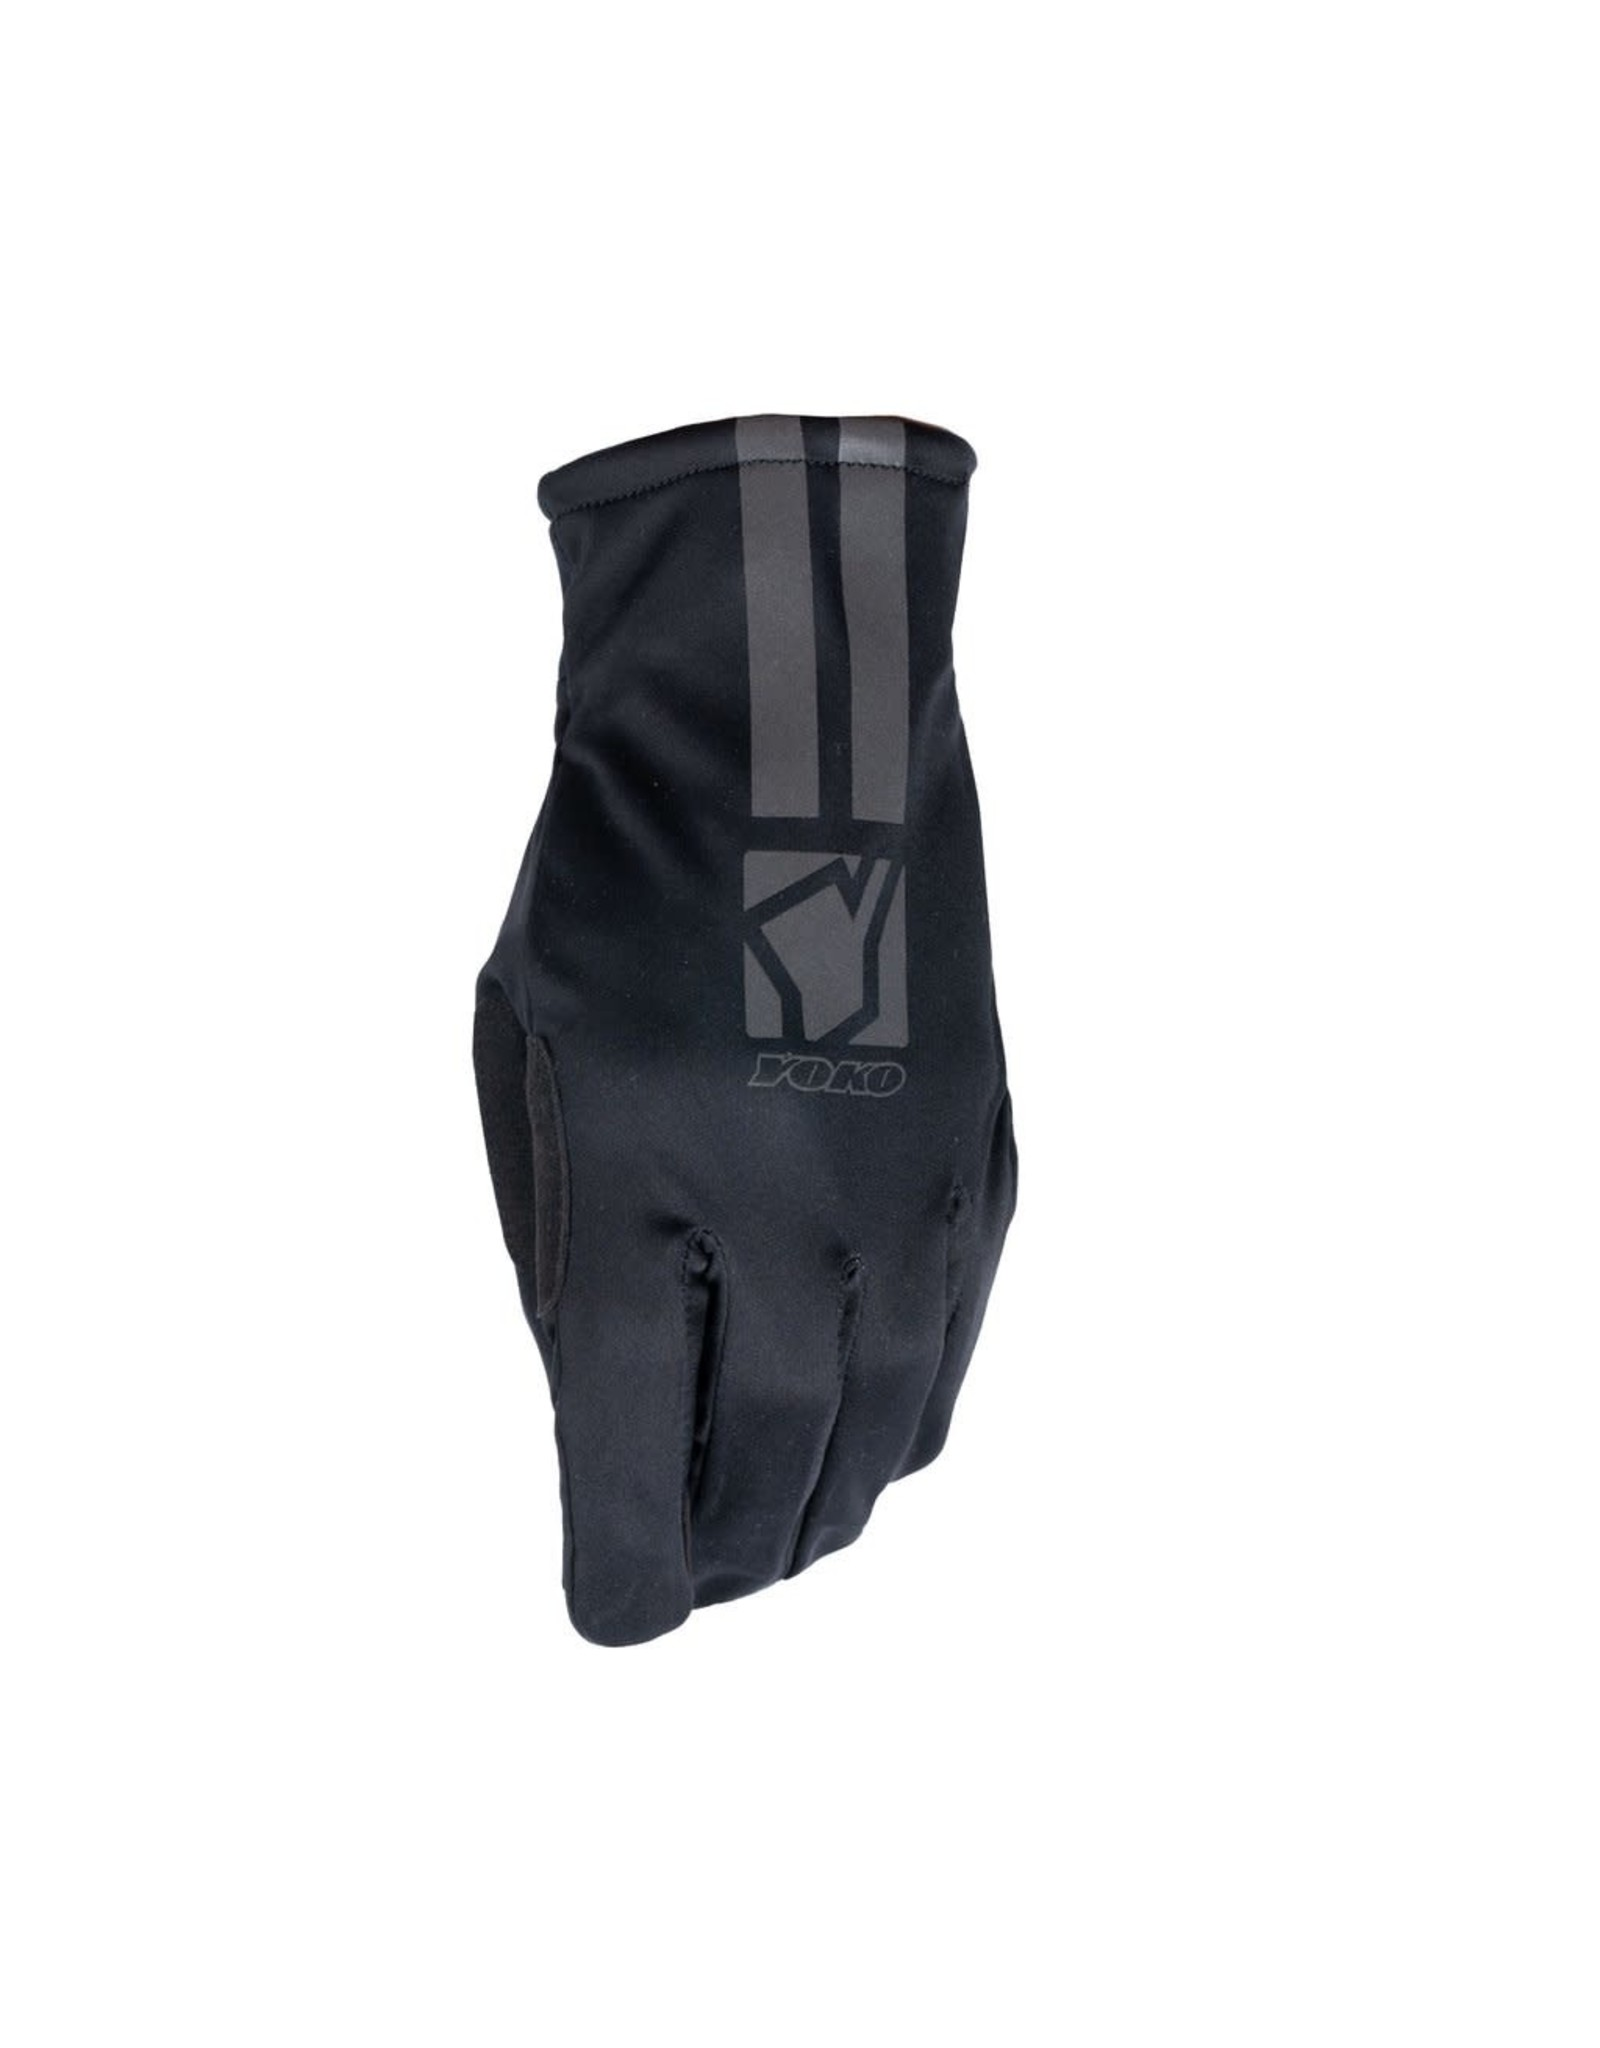 Yoko Yoko YXC Twister Glove